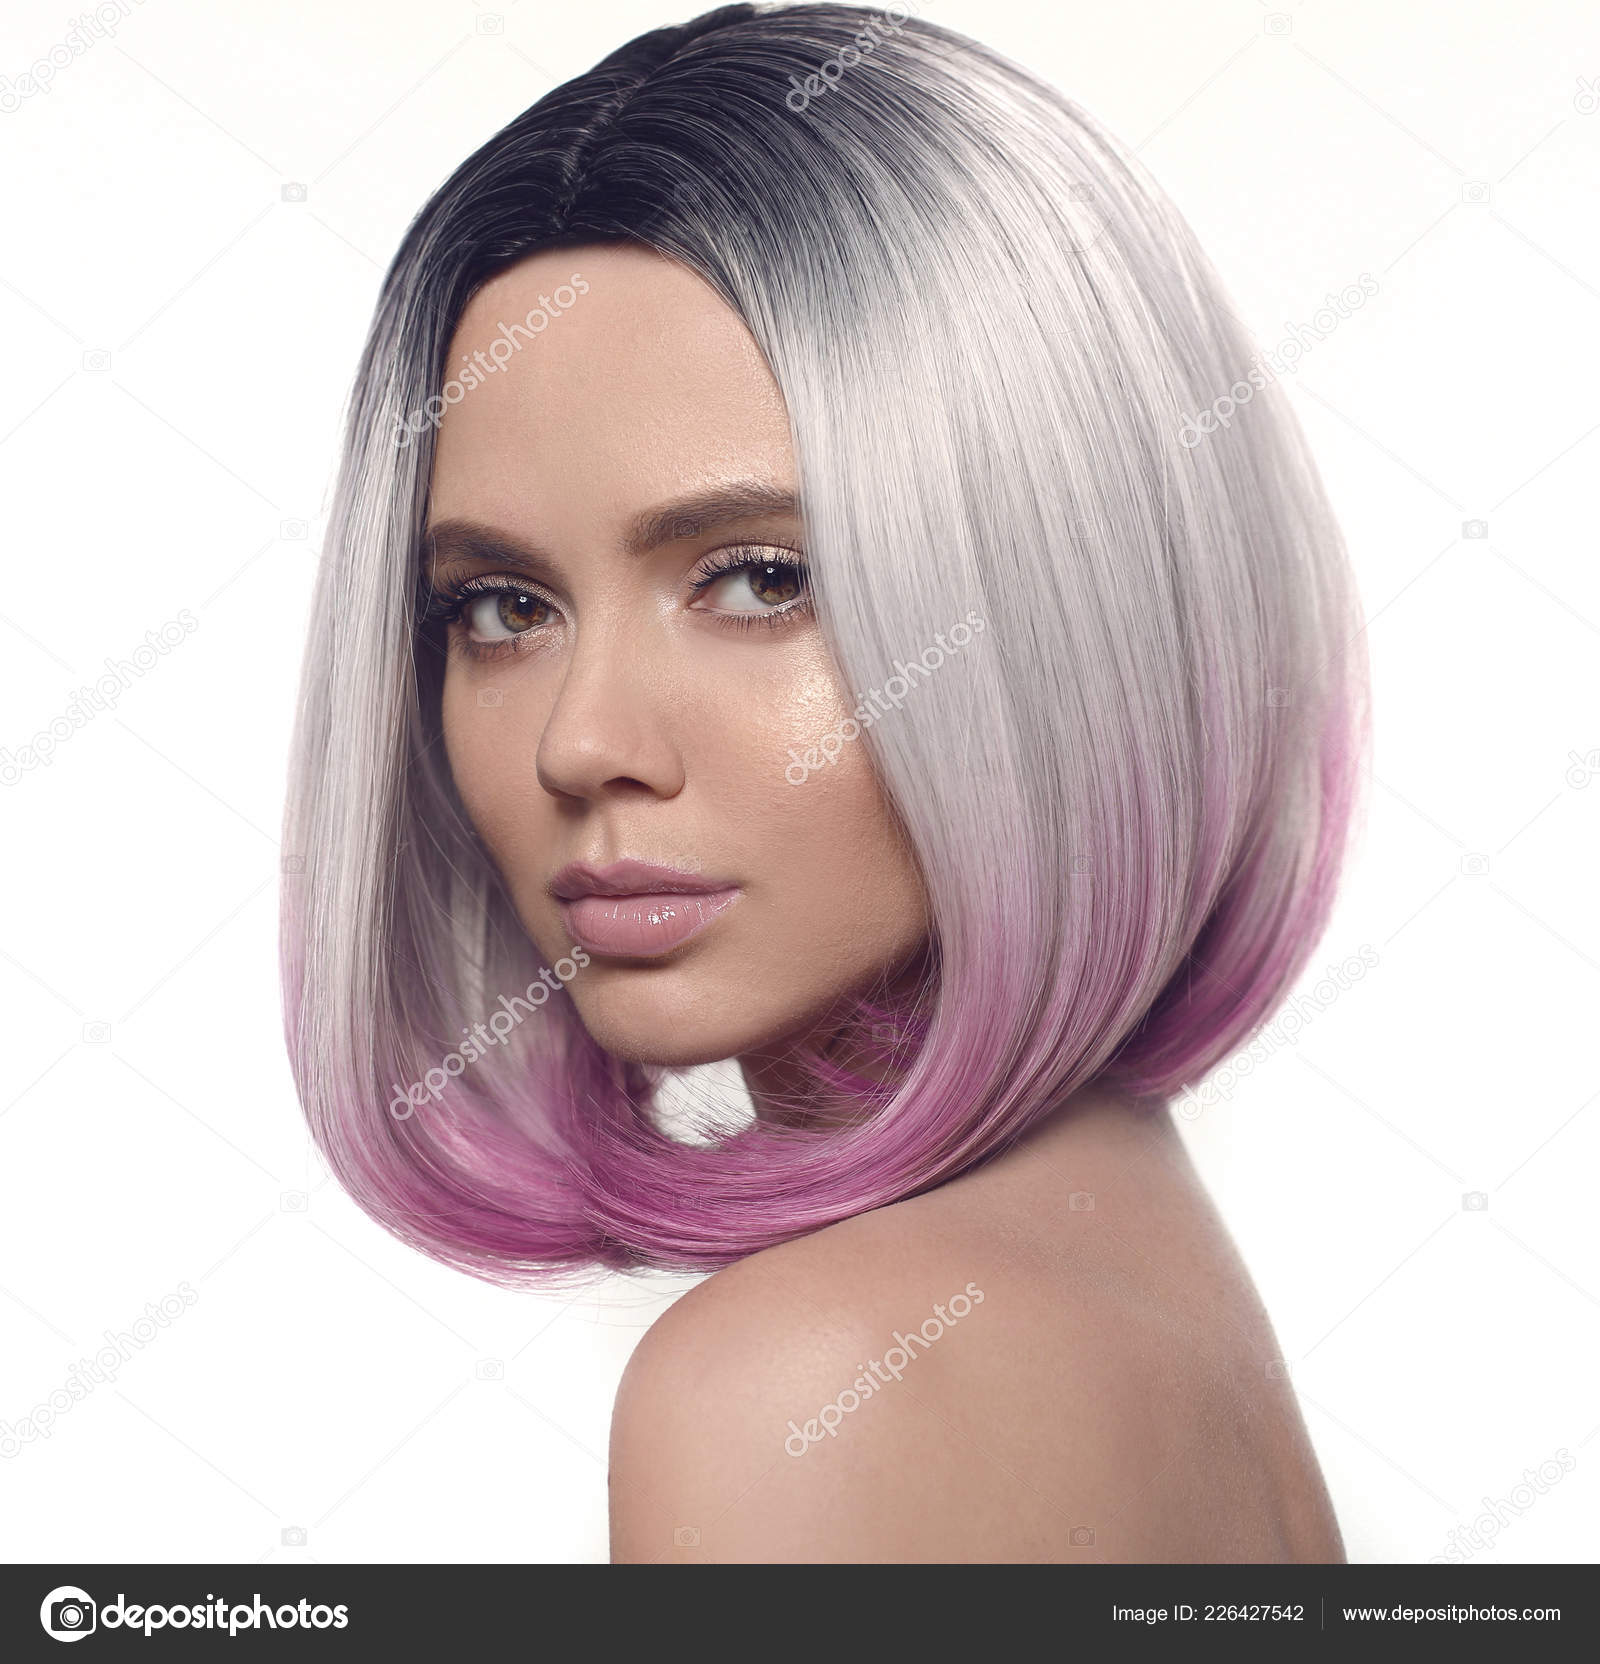 Ombre Bob Frisur Madchen Portrat Schone Kurze Haare Farben Trendige